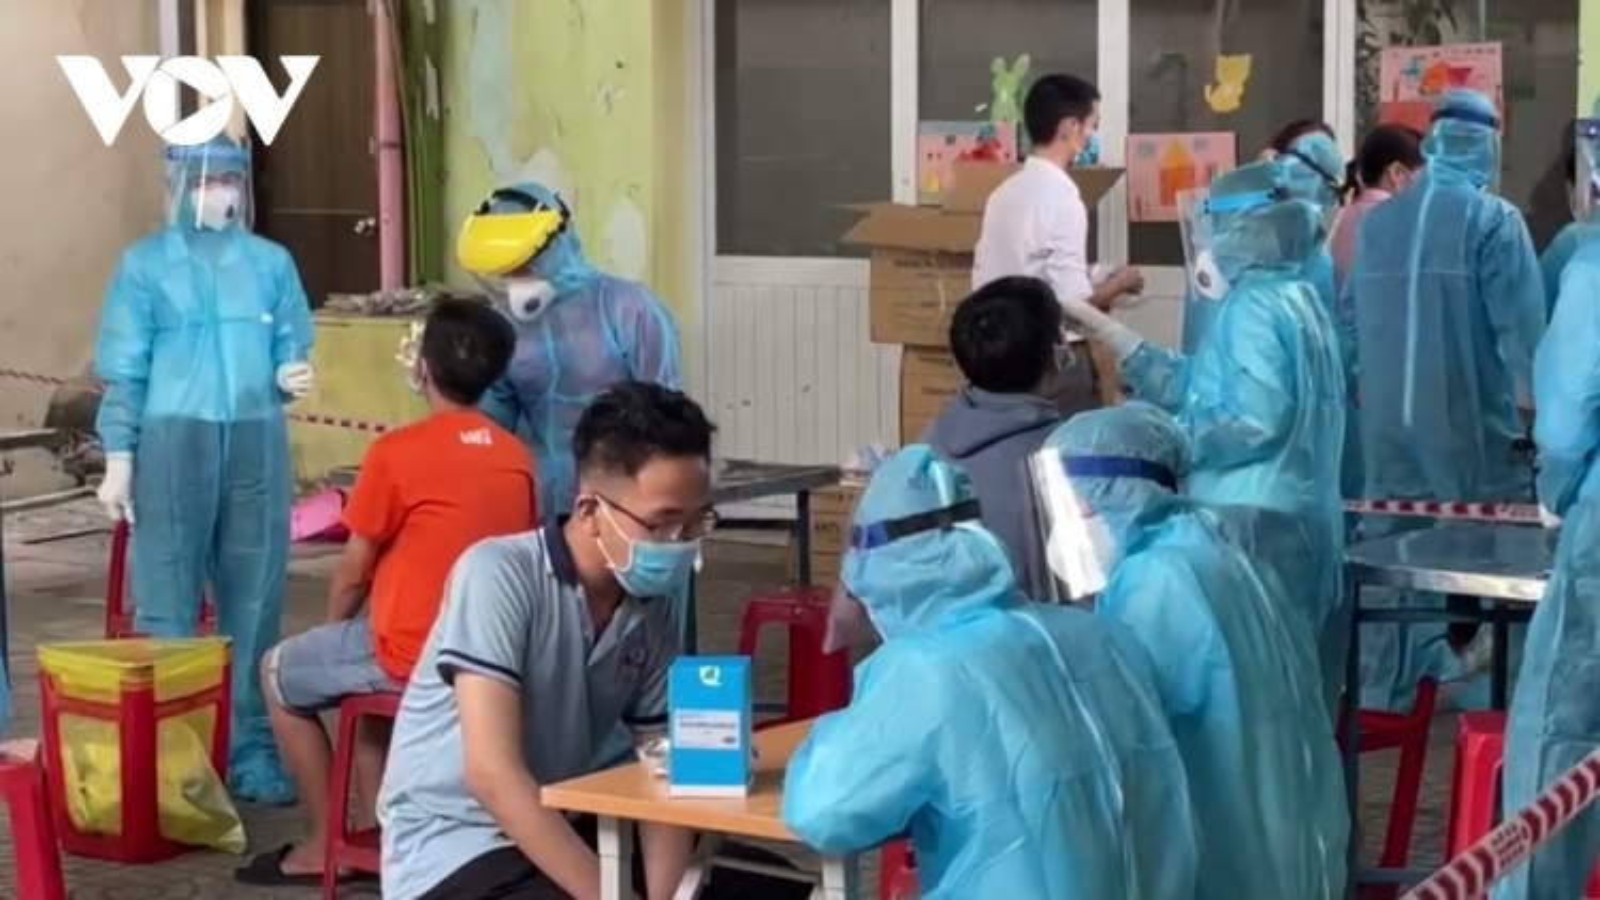 HCM City on full COVID-19 alert, sets up epidemic command centre